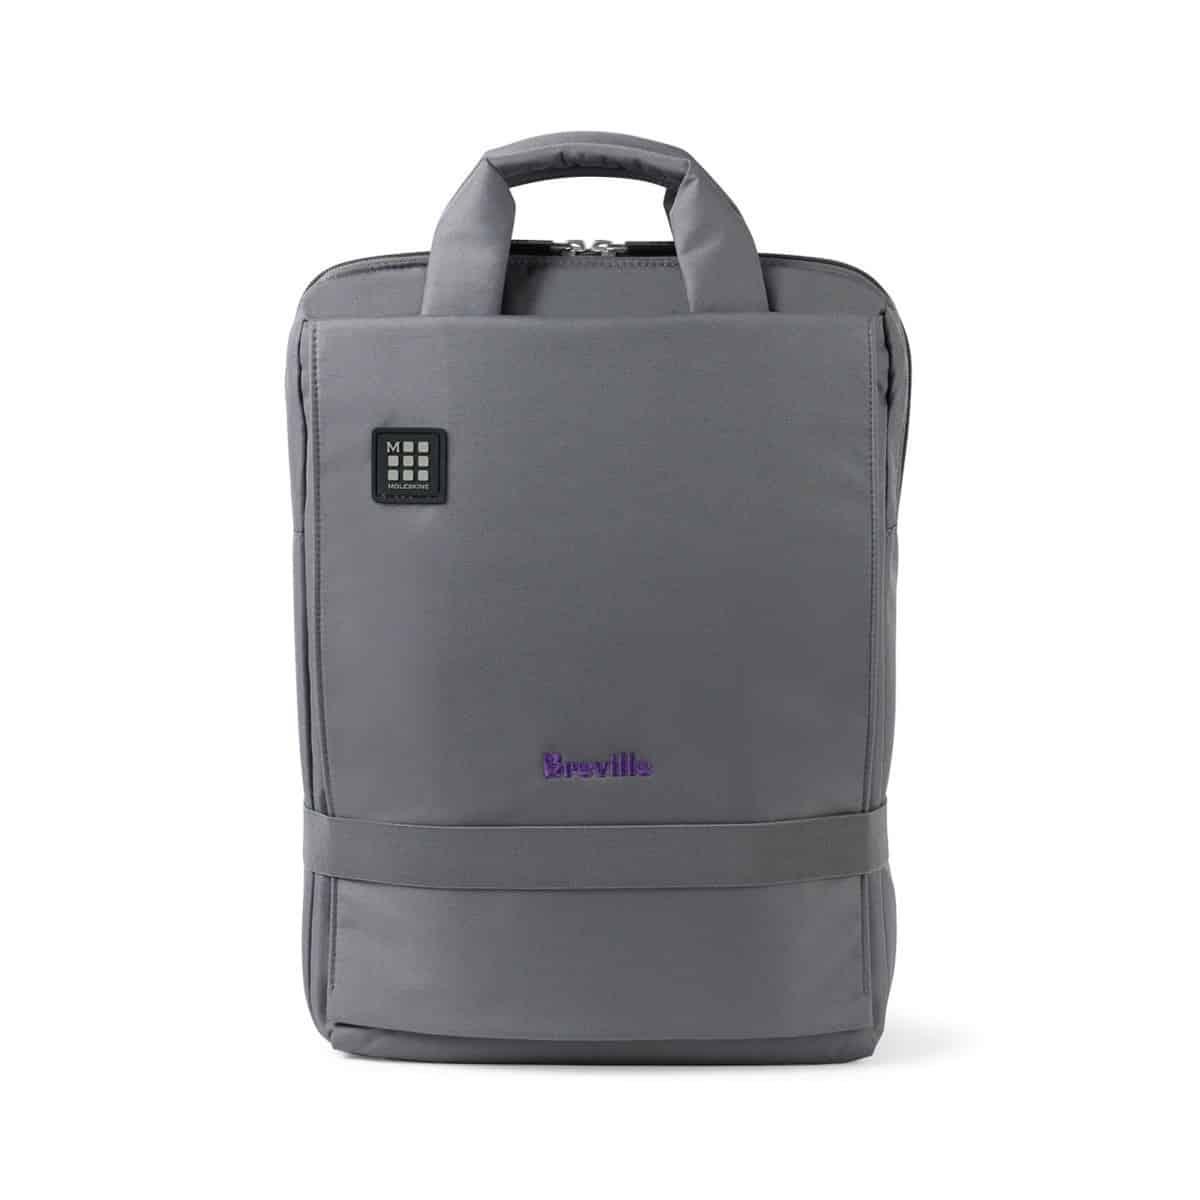 Moleskine® ID Vertical Bag for Digital Devices - 15'' Grey